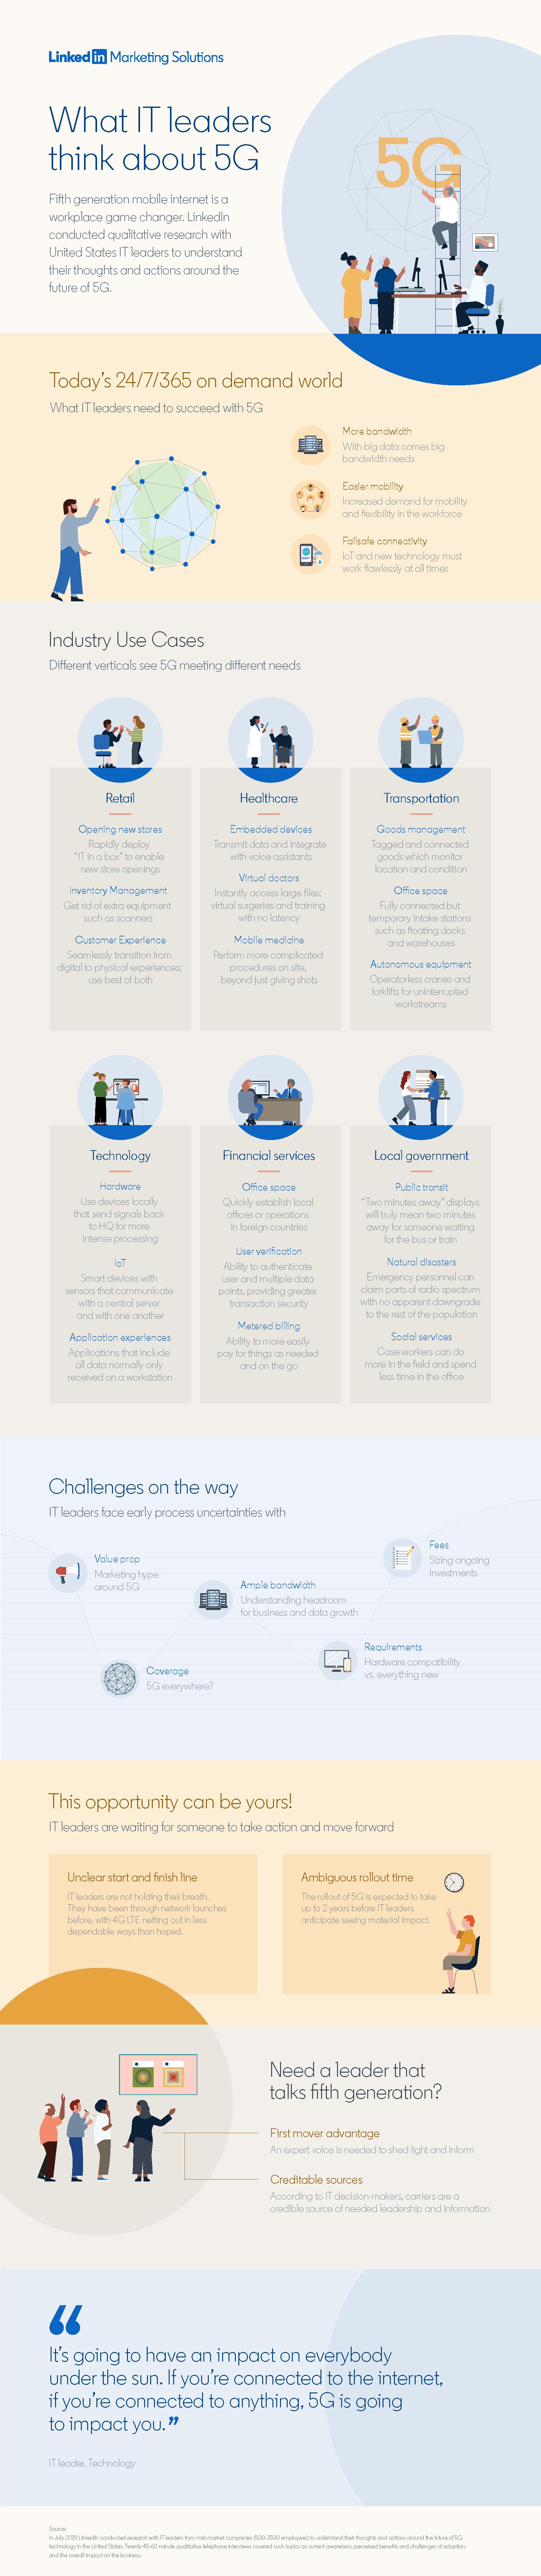 LinkedIn_5G